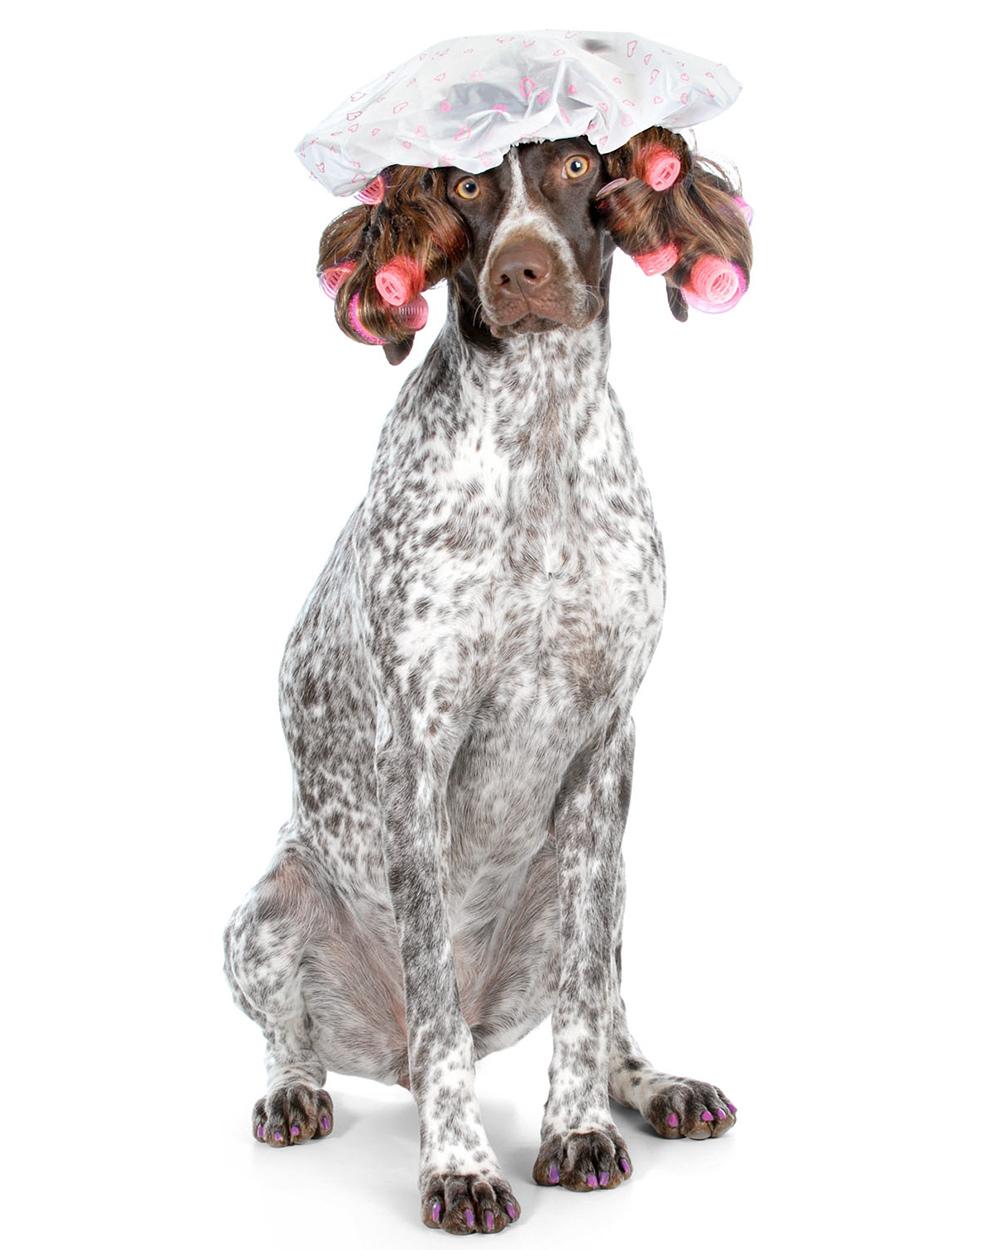 groomed dog wearing bathing cap